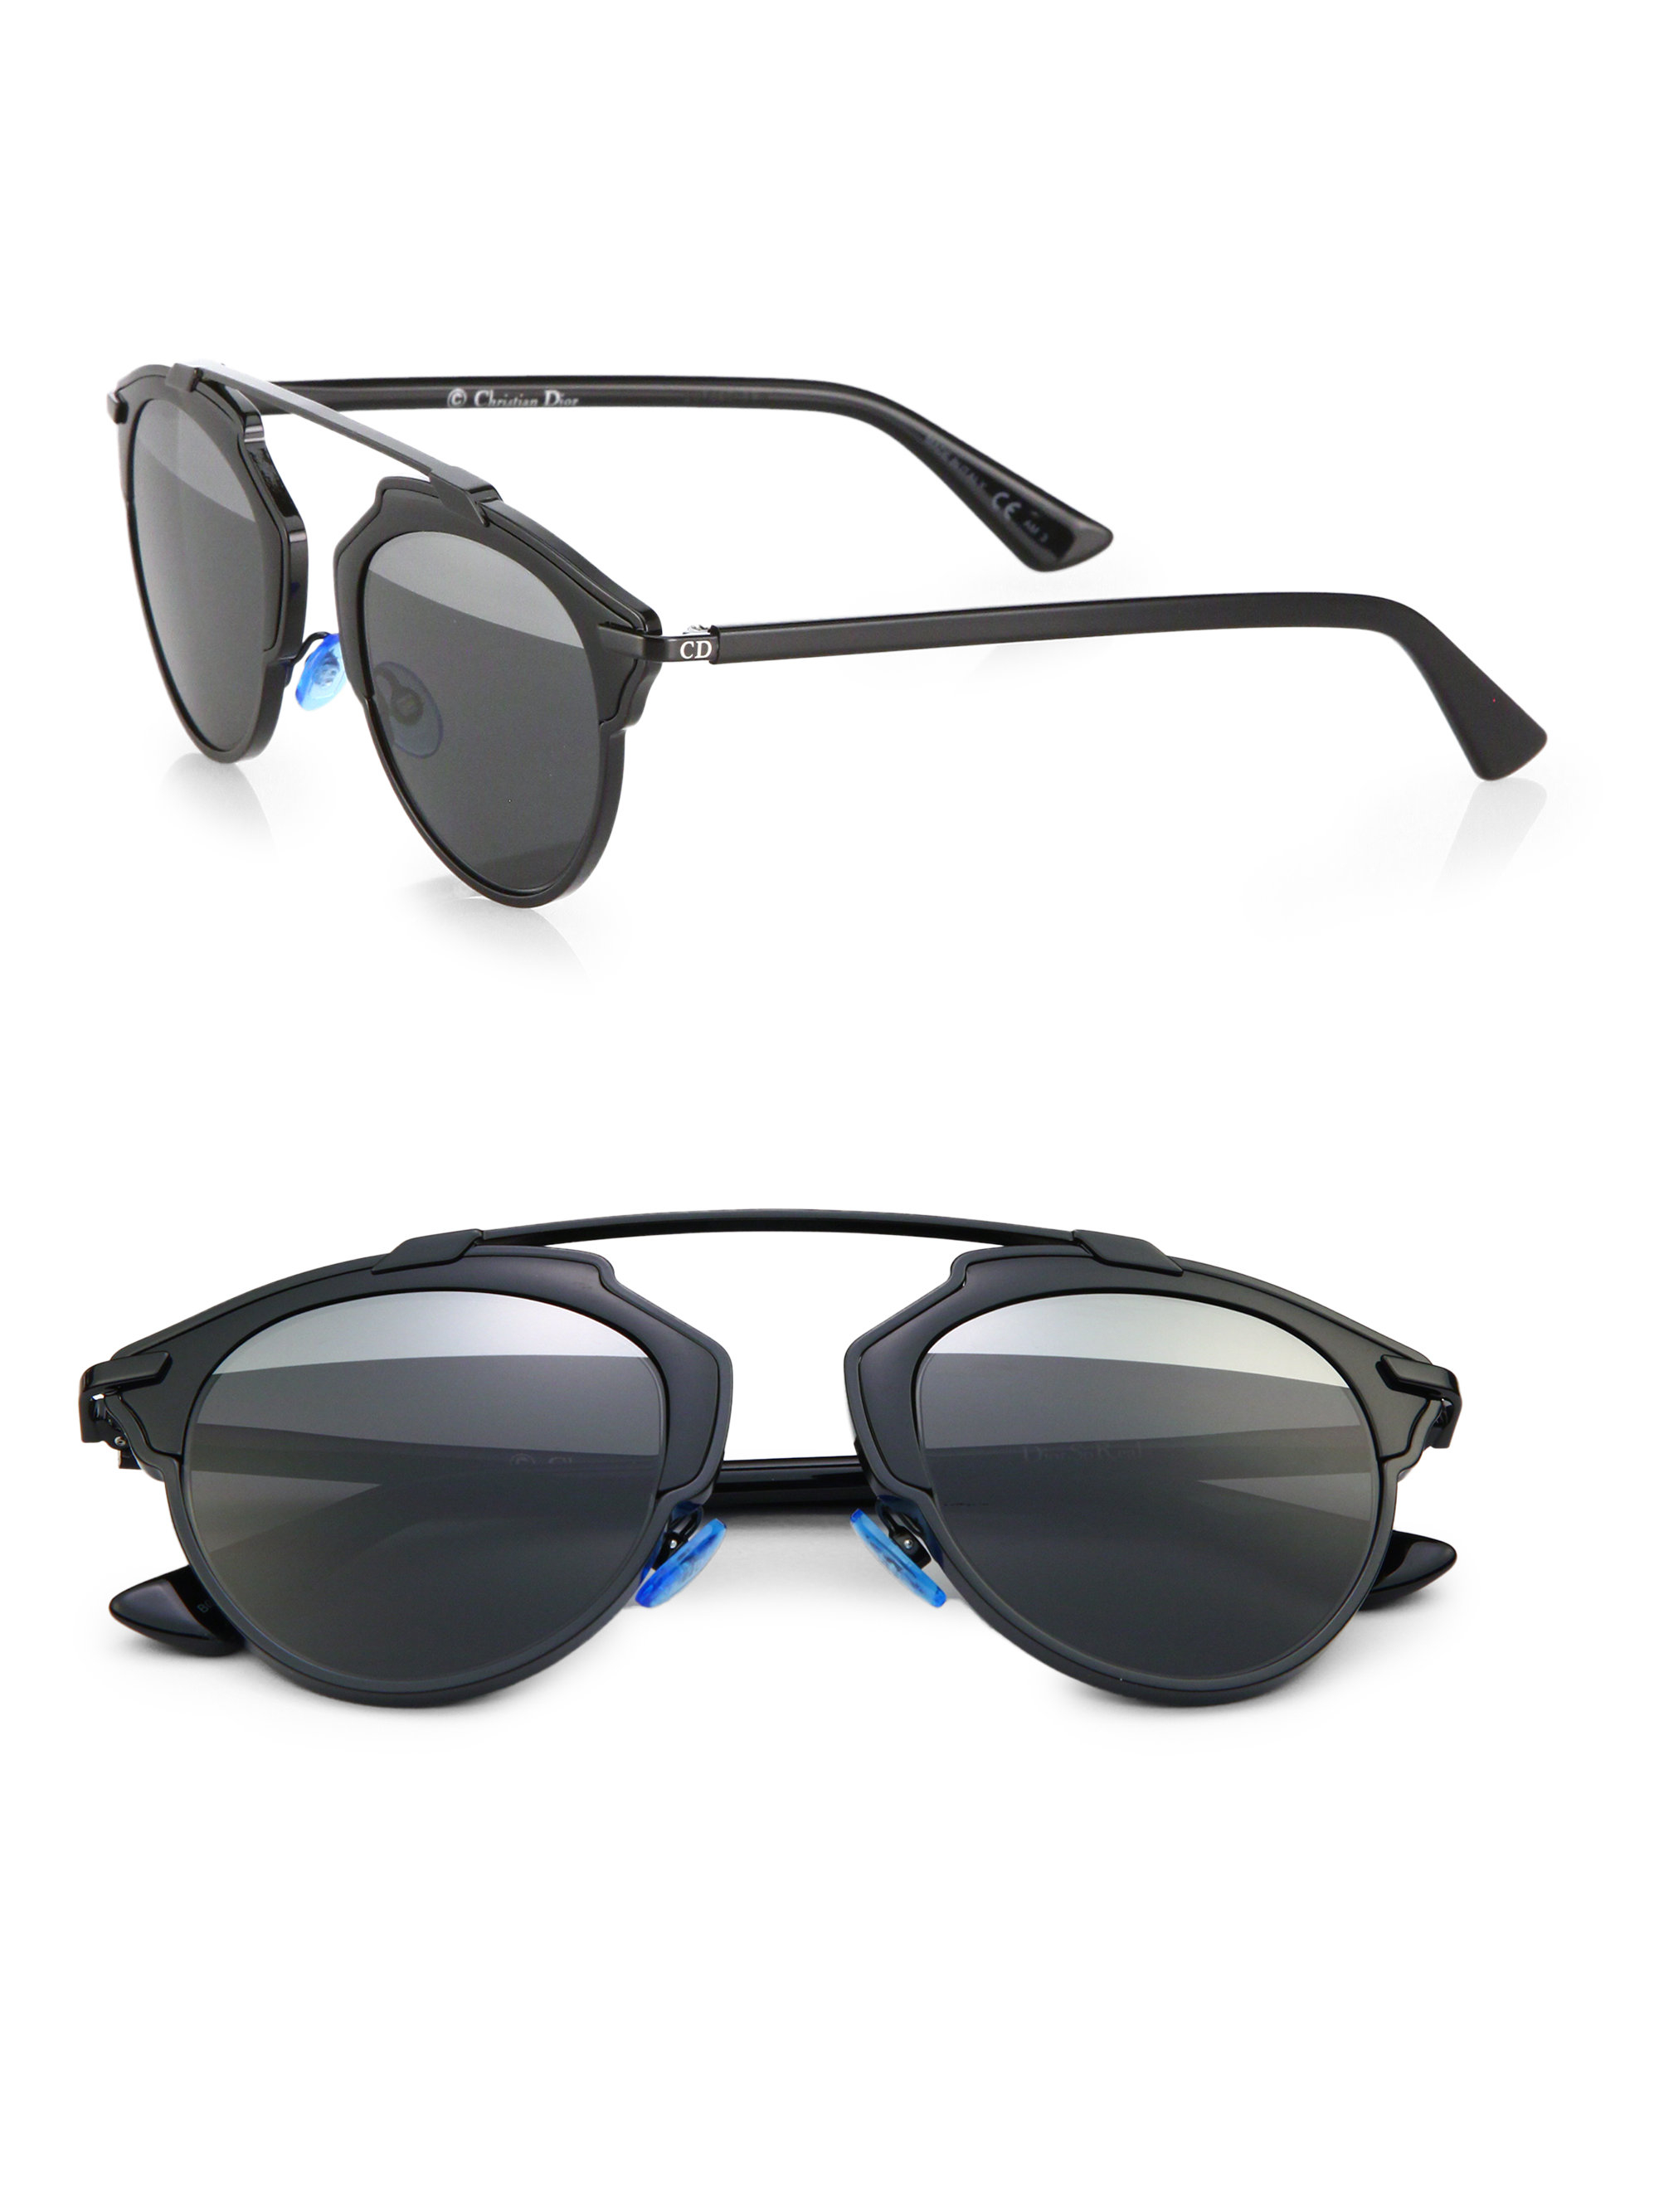 b5879a769c2 Dior So Real Metal   Plastic Sunglasses in Black